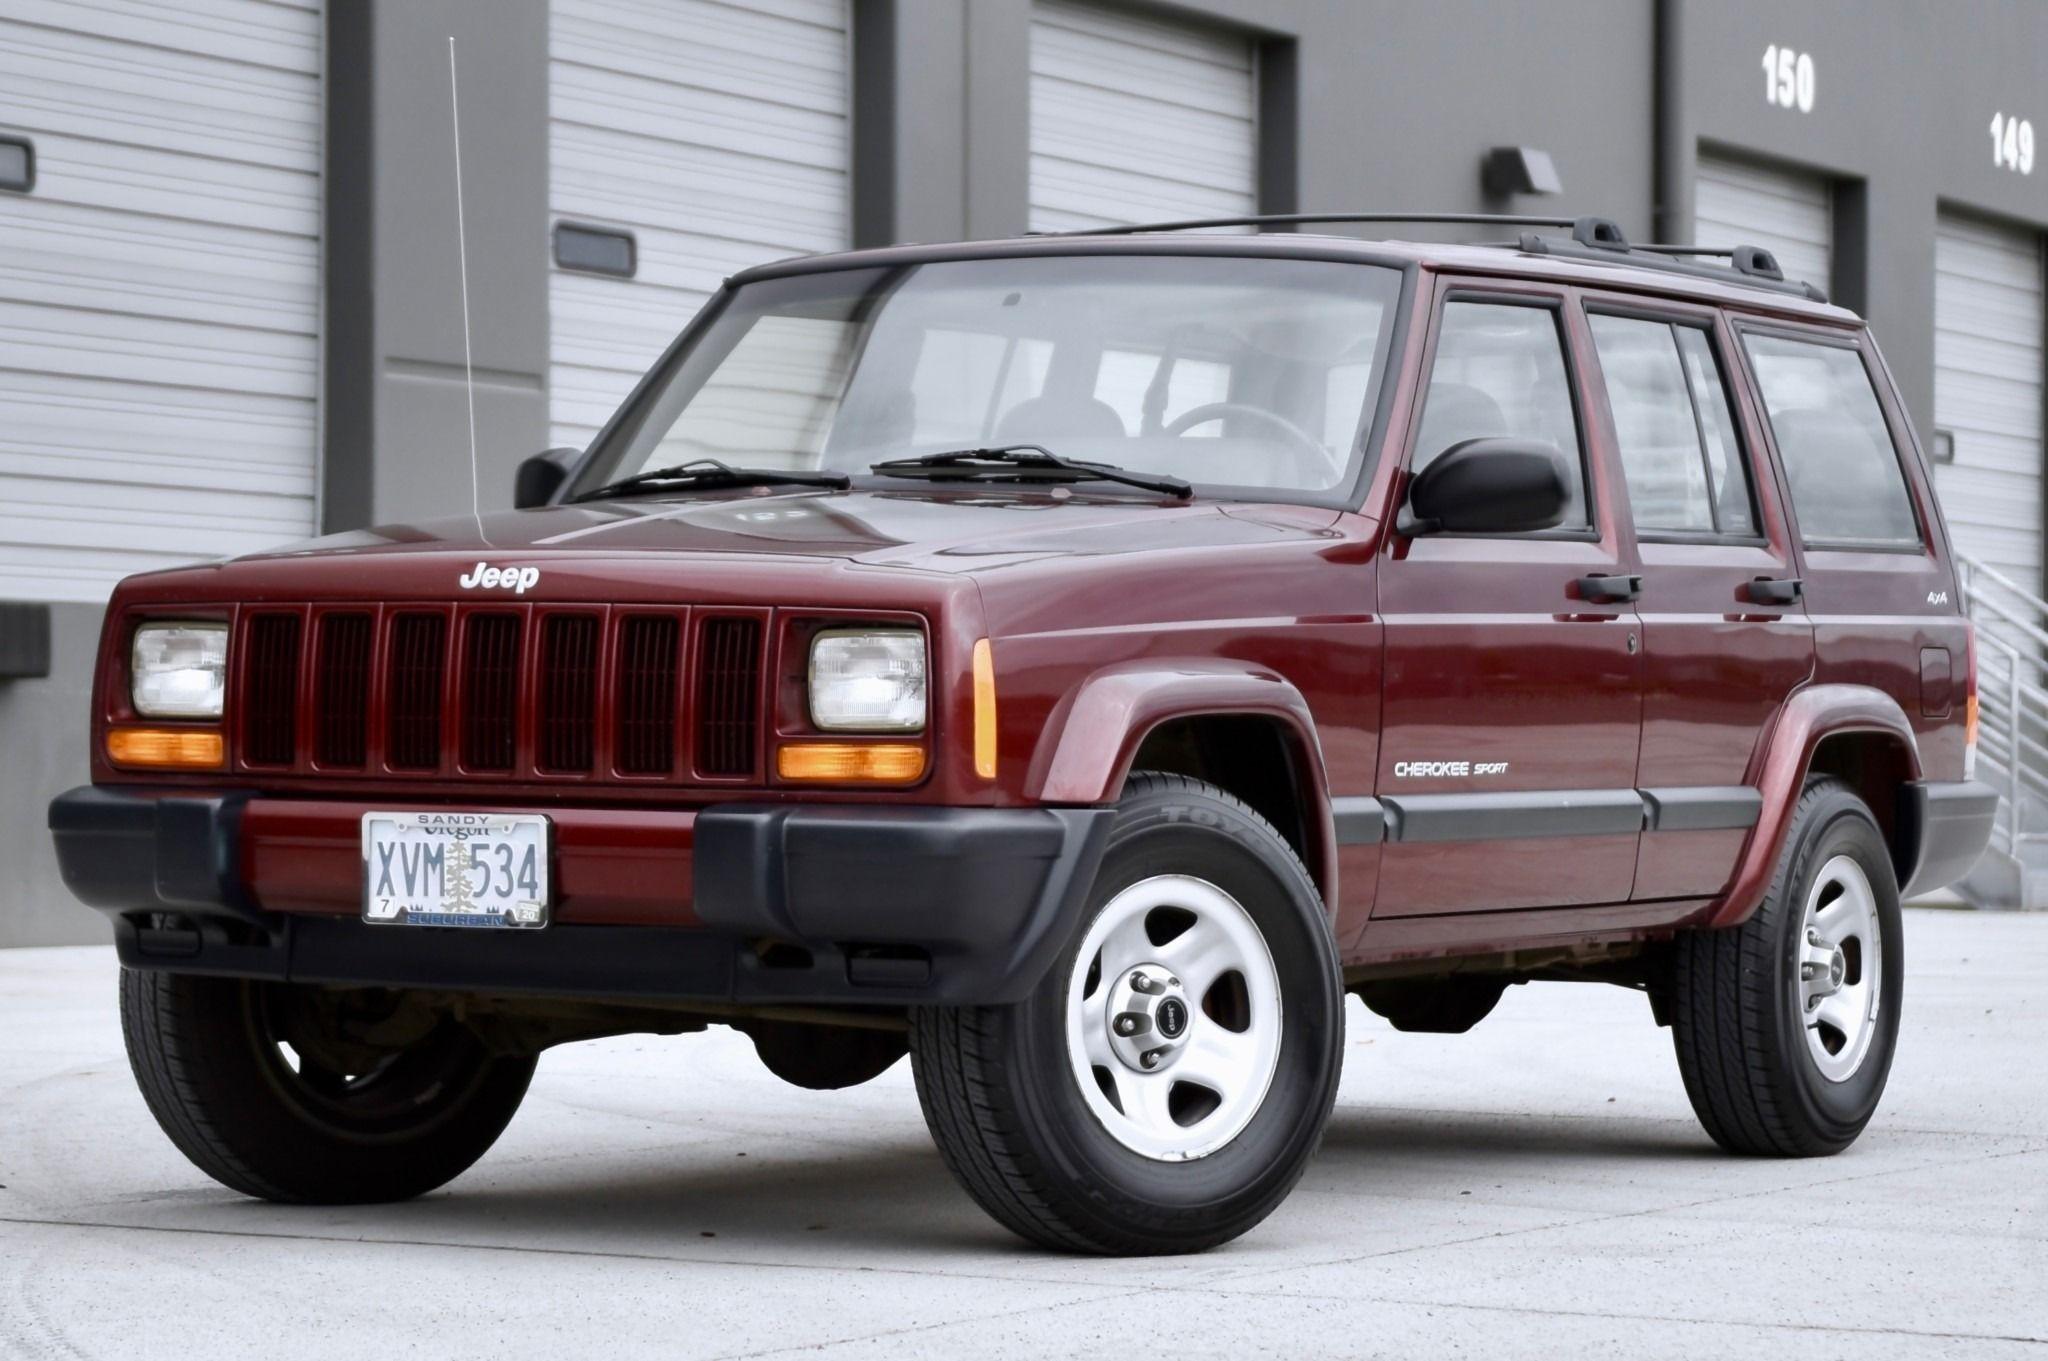 2000 Jeep Cherokee Sport 4×4 Cherokee sport, Jeep